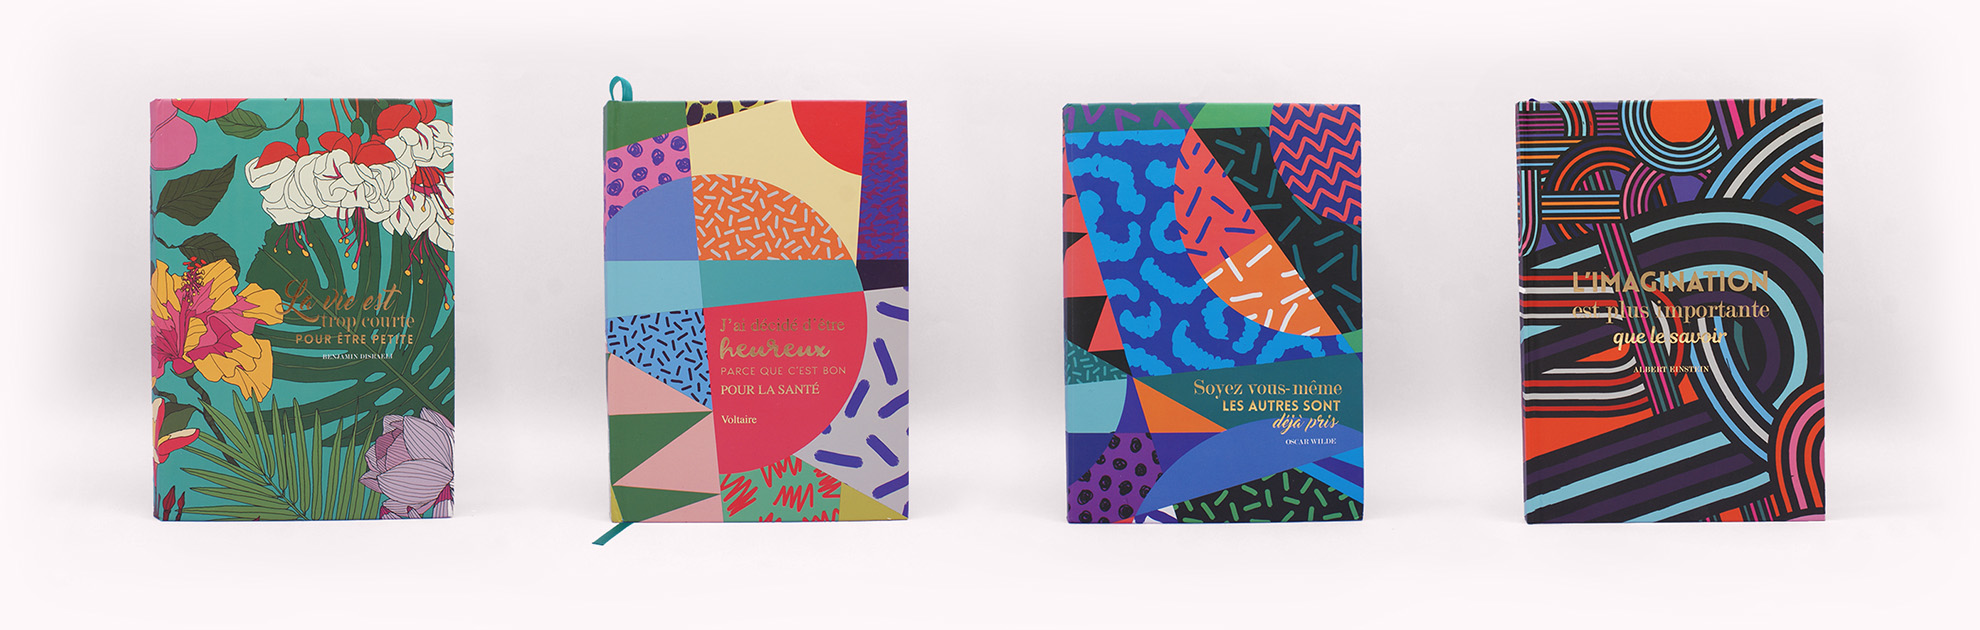 serie editor carnet foulard lyon motif